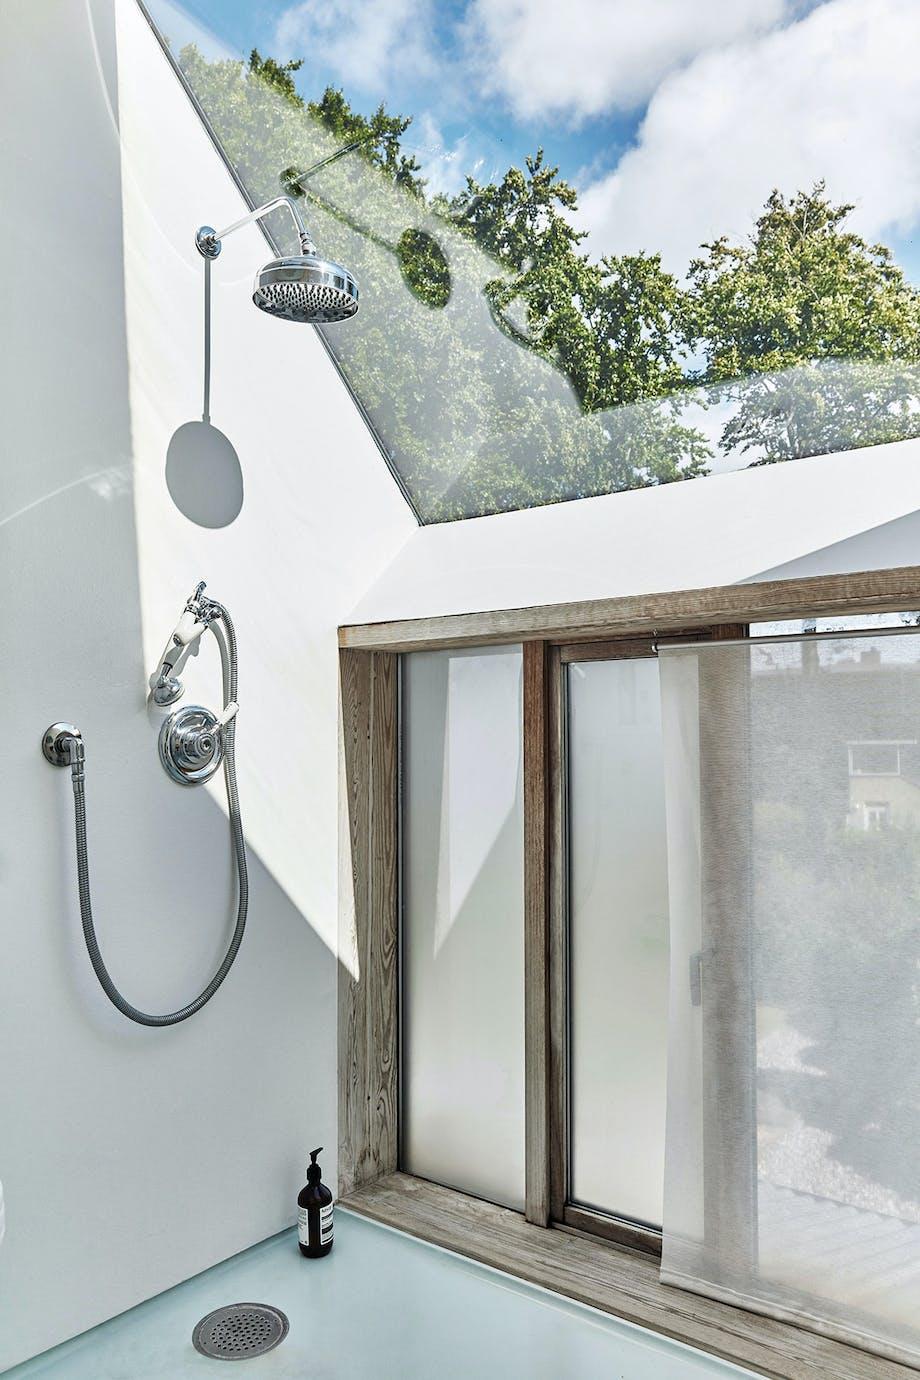 badeværelse loftvinduer udsigt brusekabine